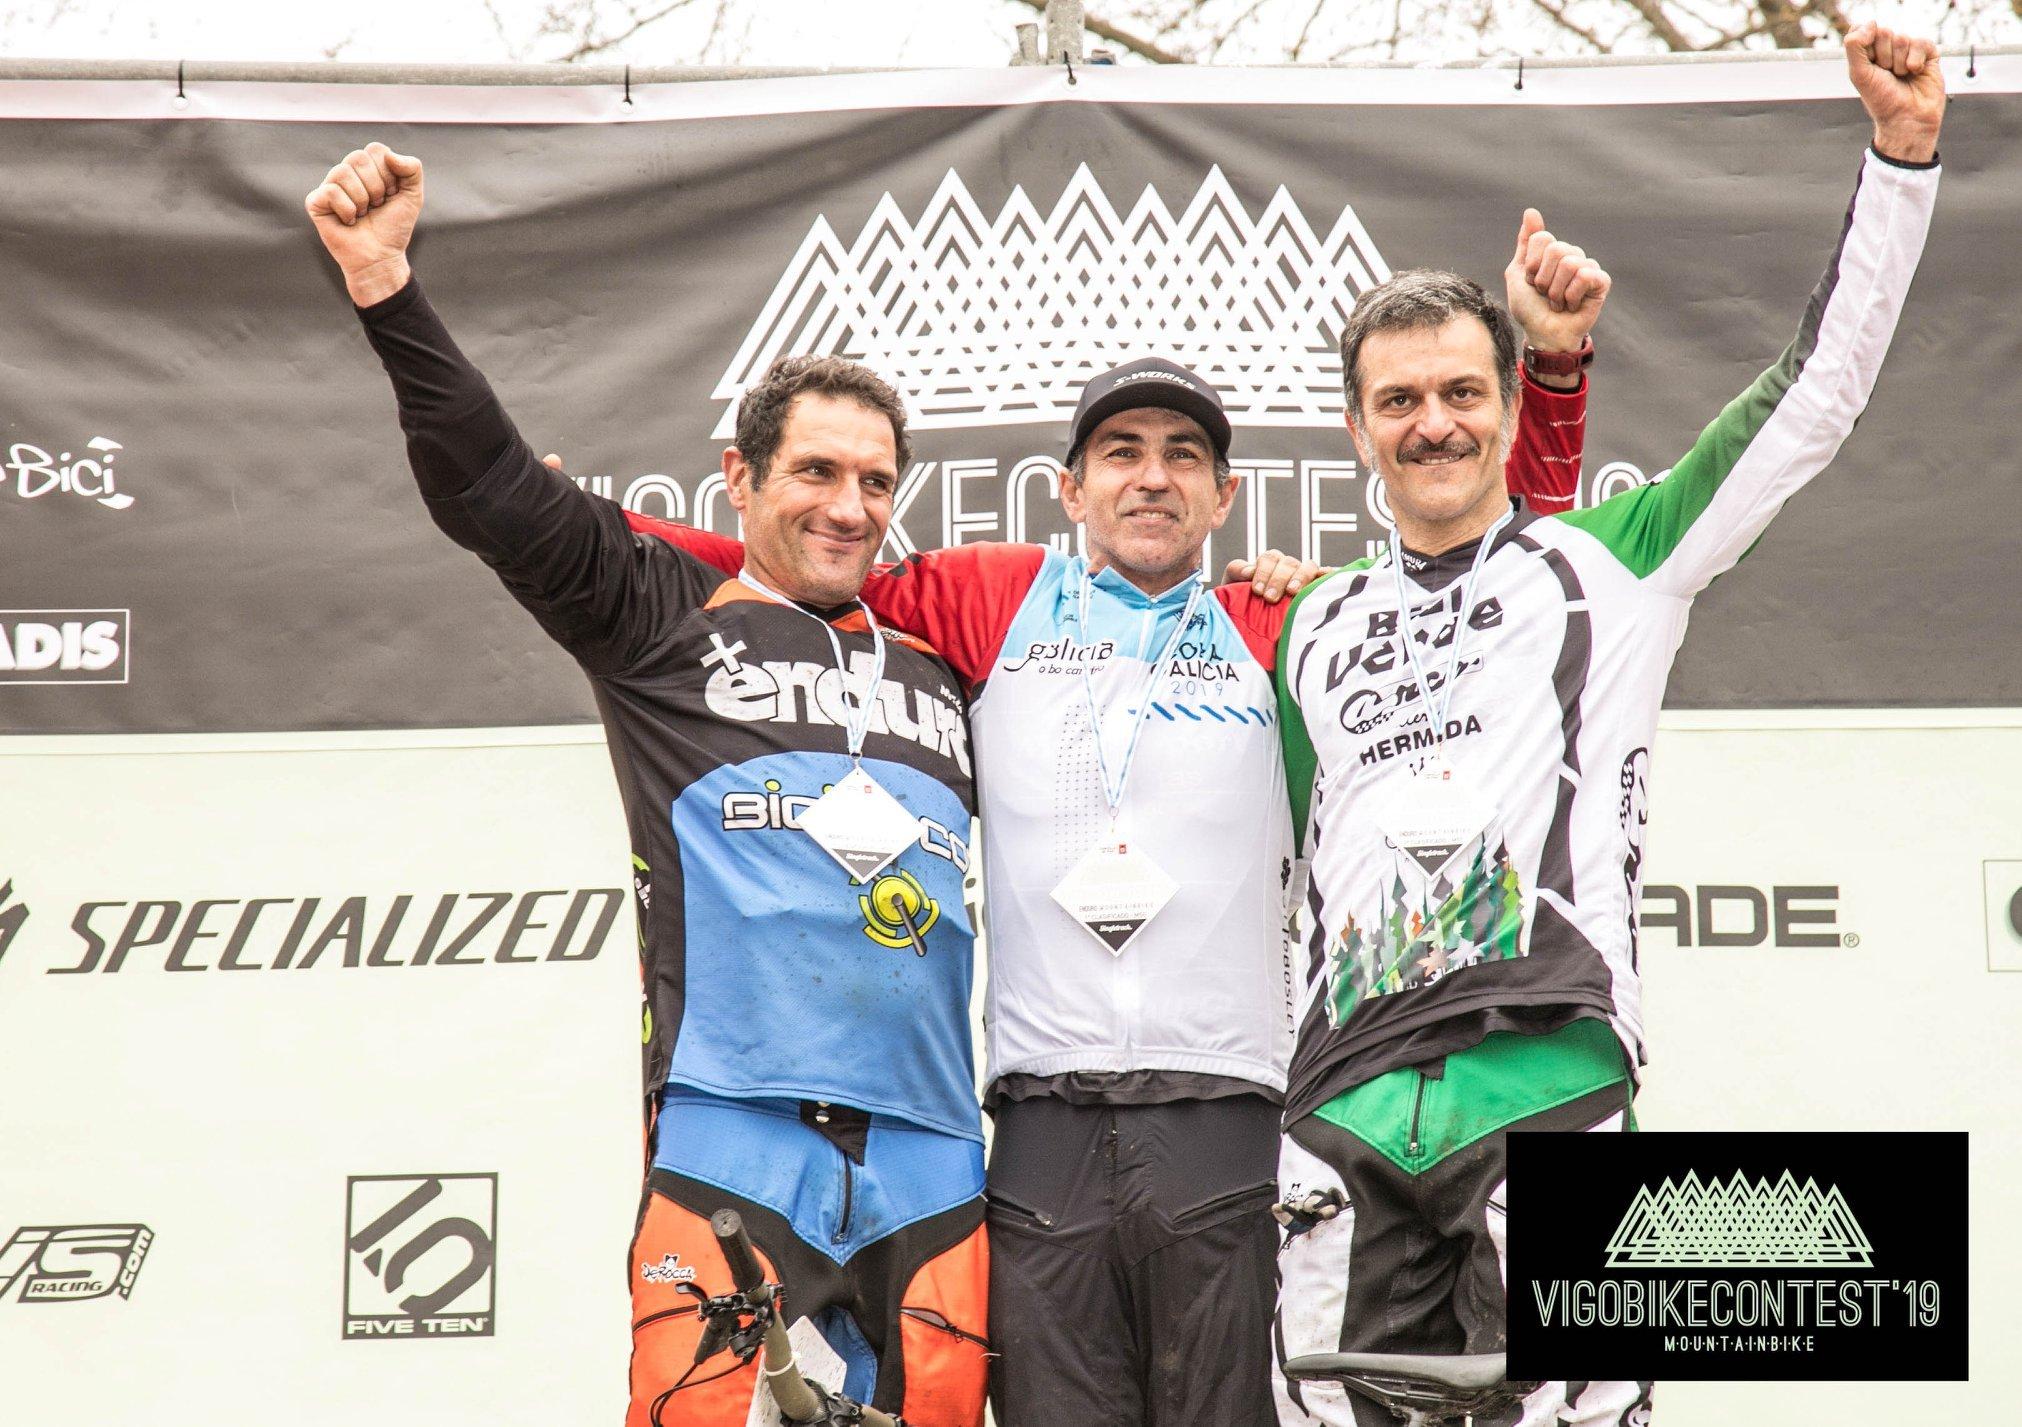 Manuel Gómez, 3º máster 50 en el VigoBikeContest